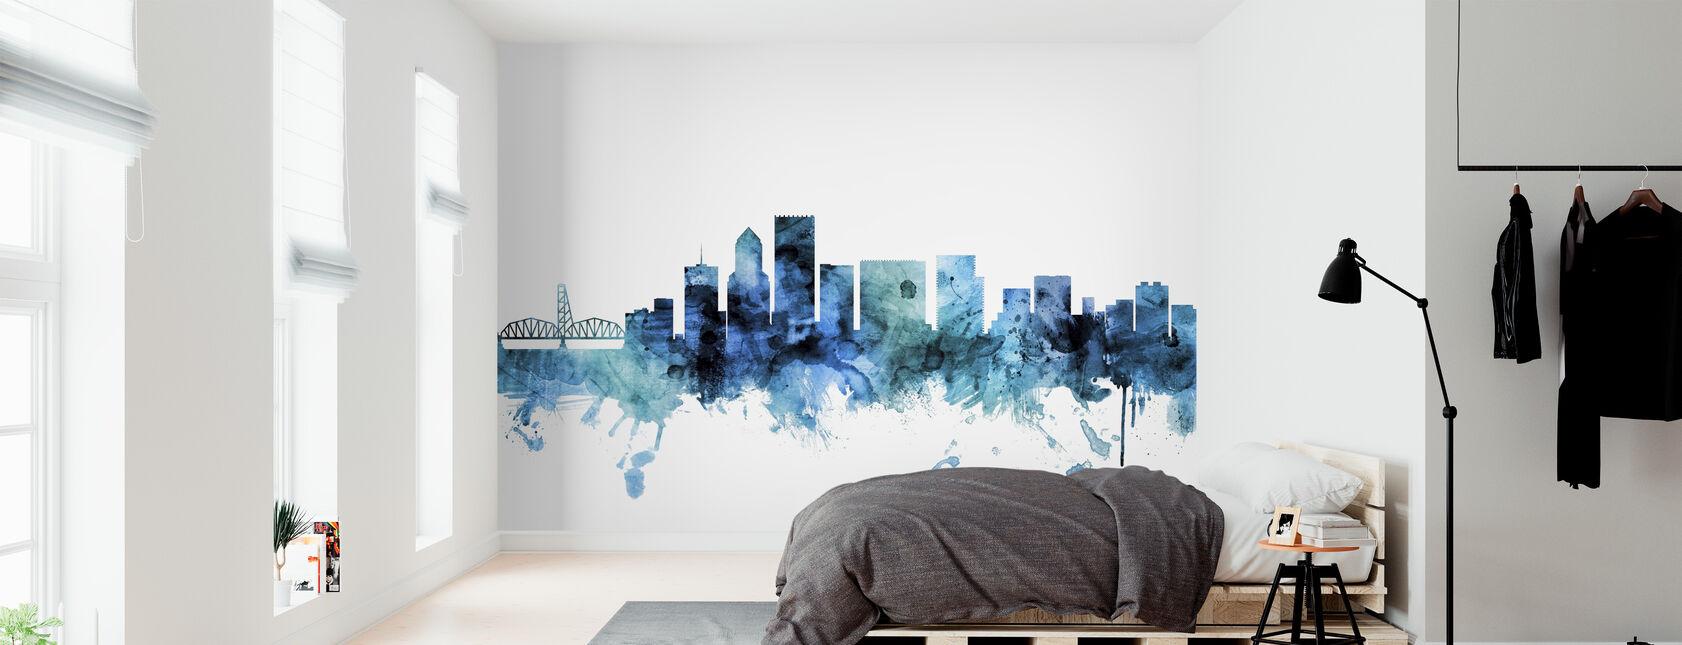 Portland Oregon Skyline - Wallpaper - Bedroom